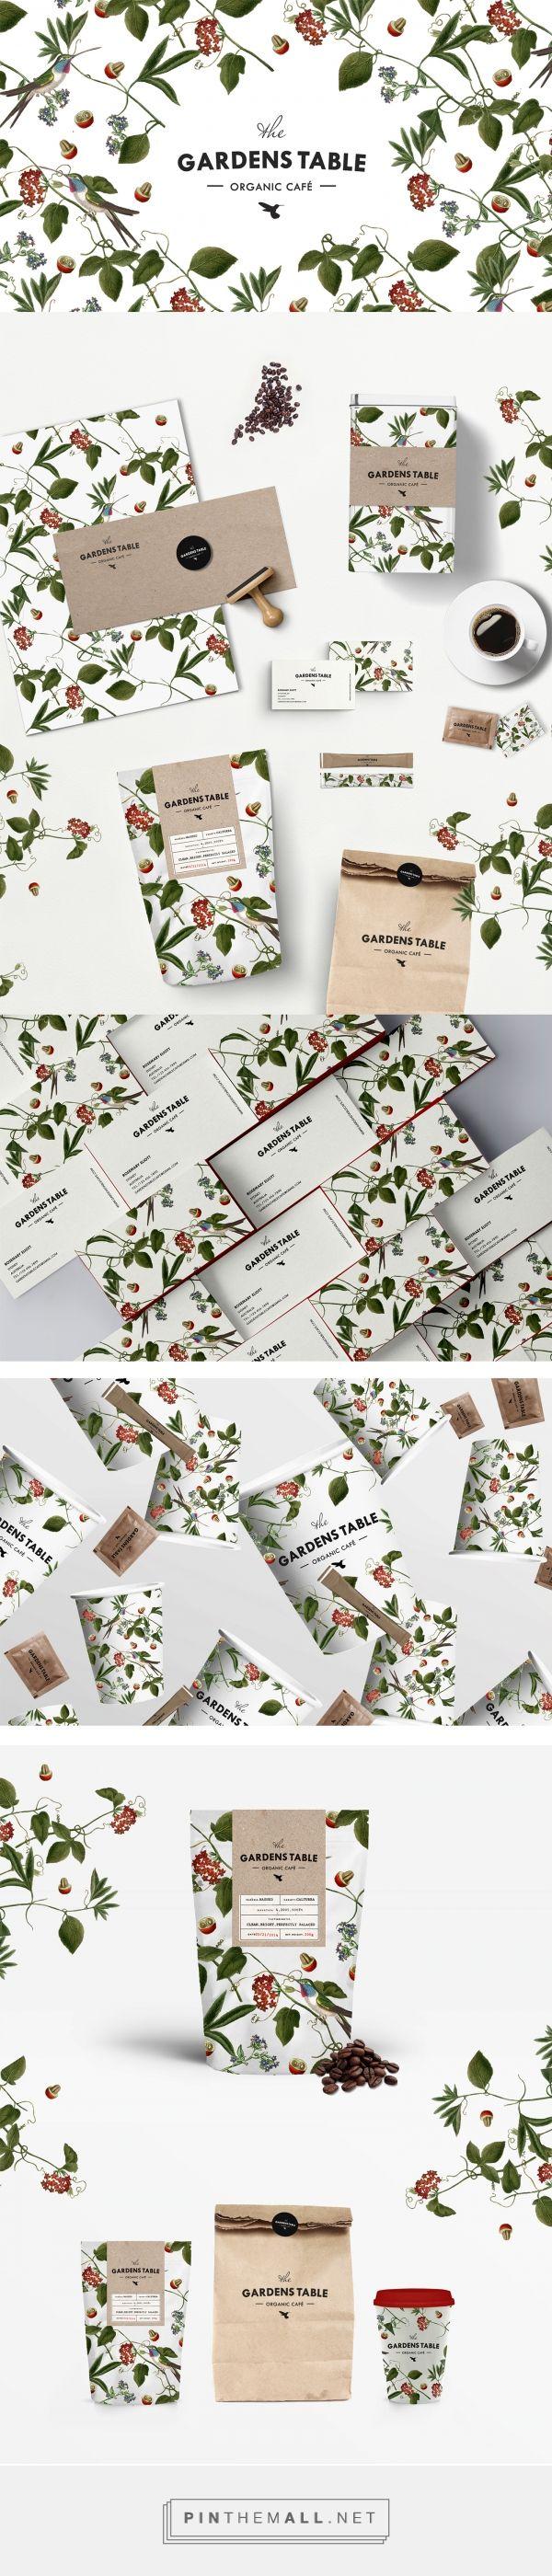 The GARDENS TABLE organic café, branding, graphic design